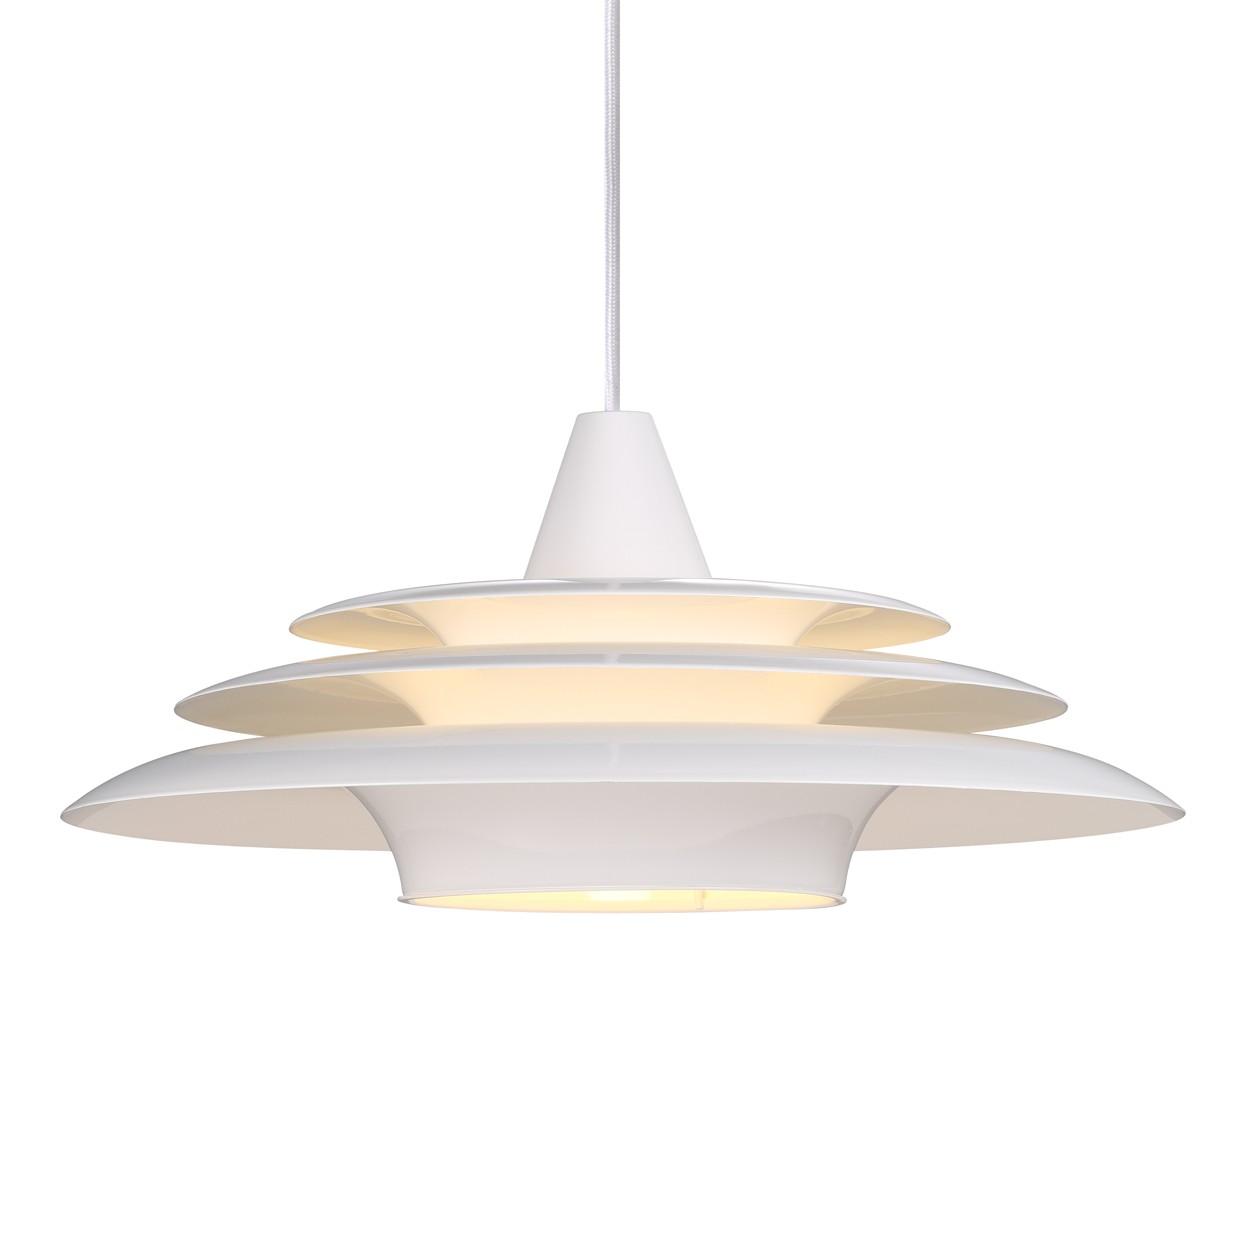 Lampada a sospensione Saturn, Nordlux